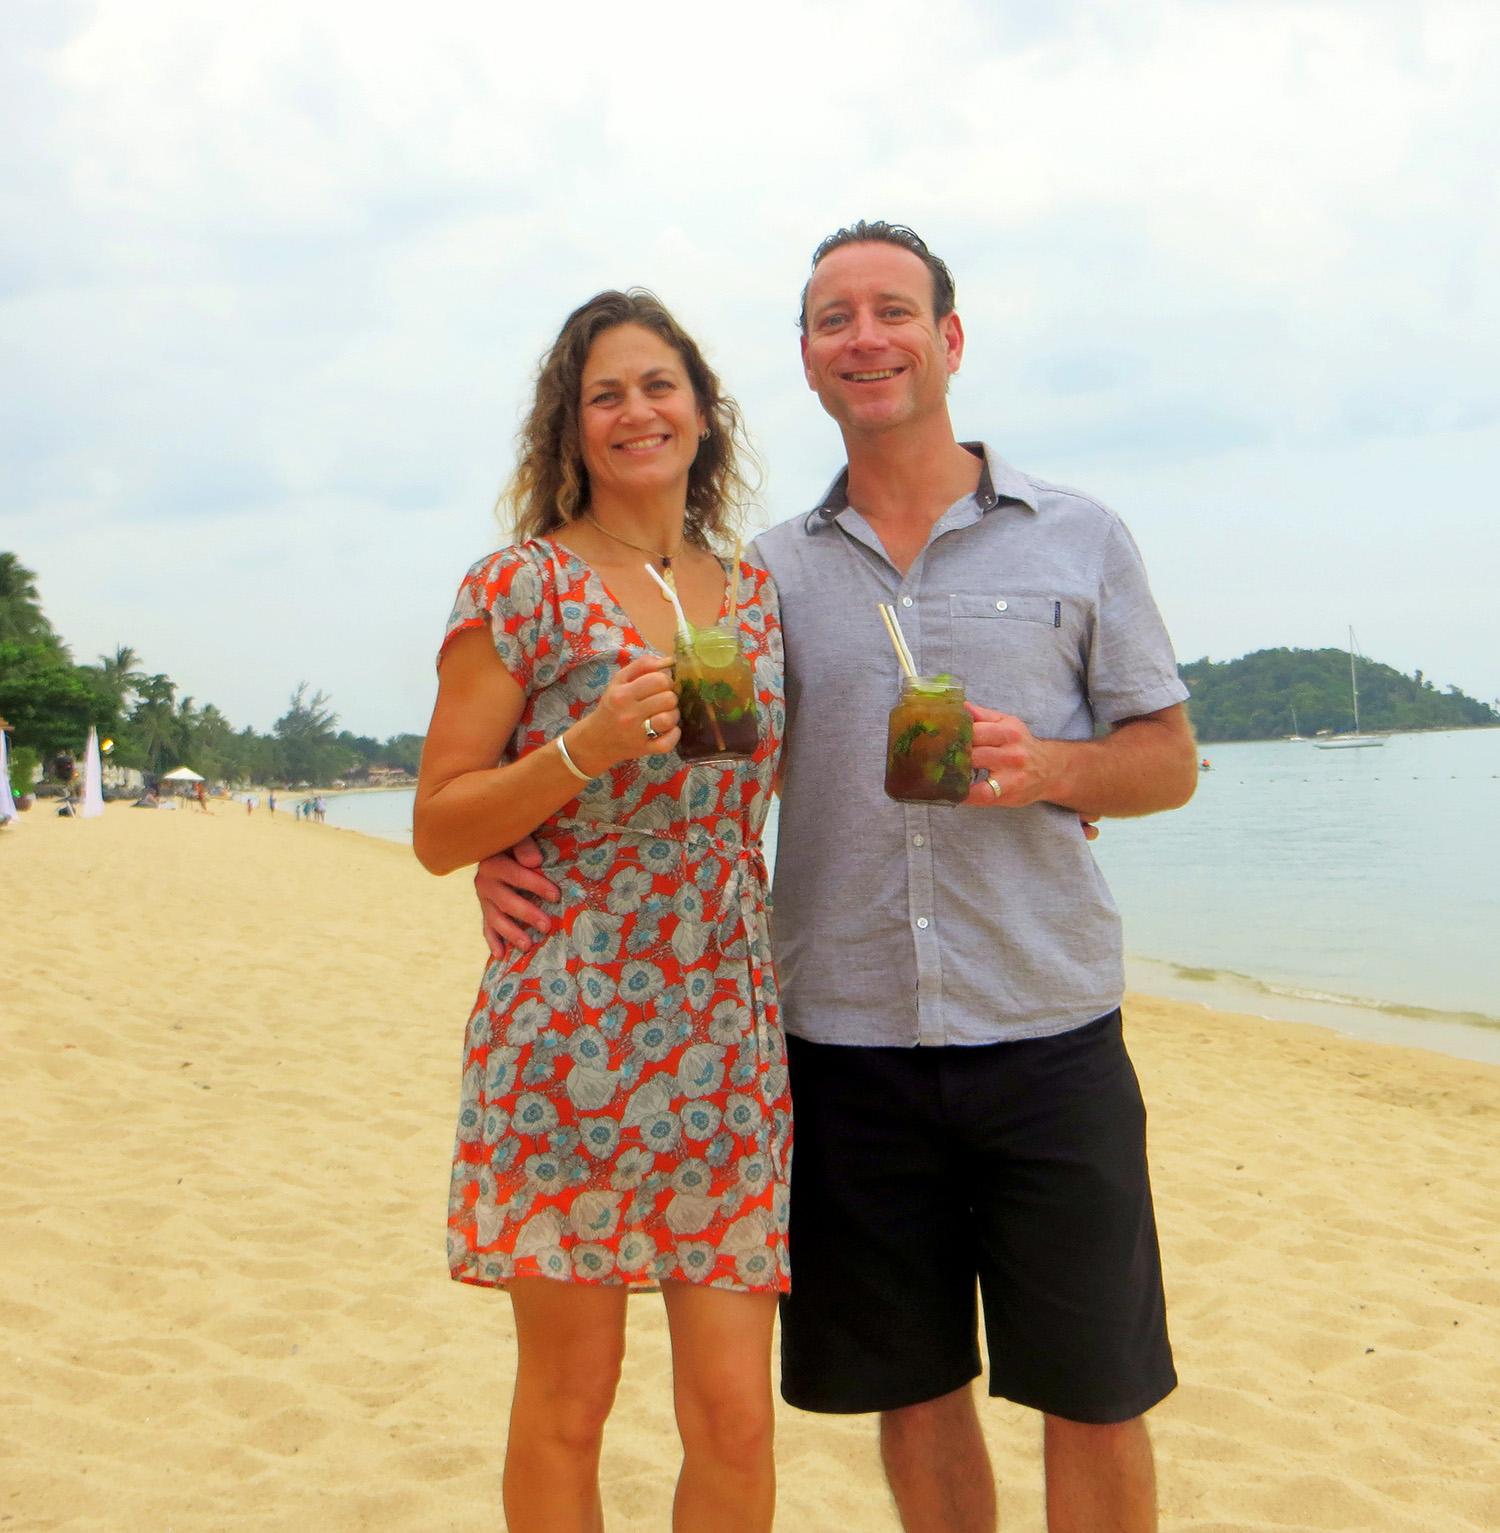 Andrew and Rachel Welch - Bophut Beach - Koh Samui 2015